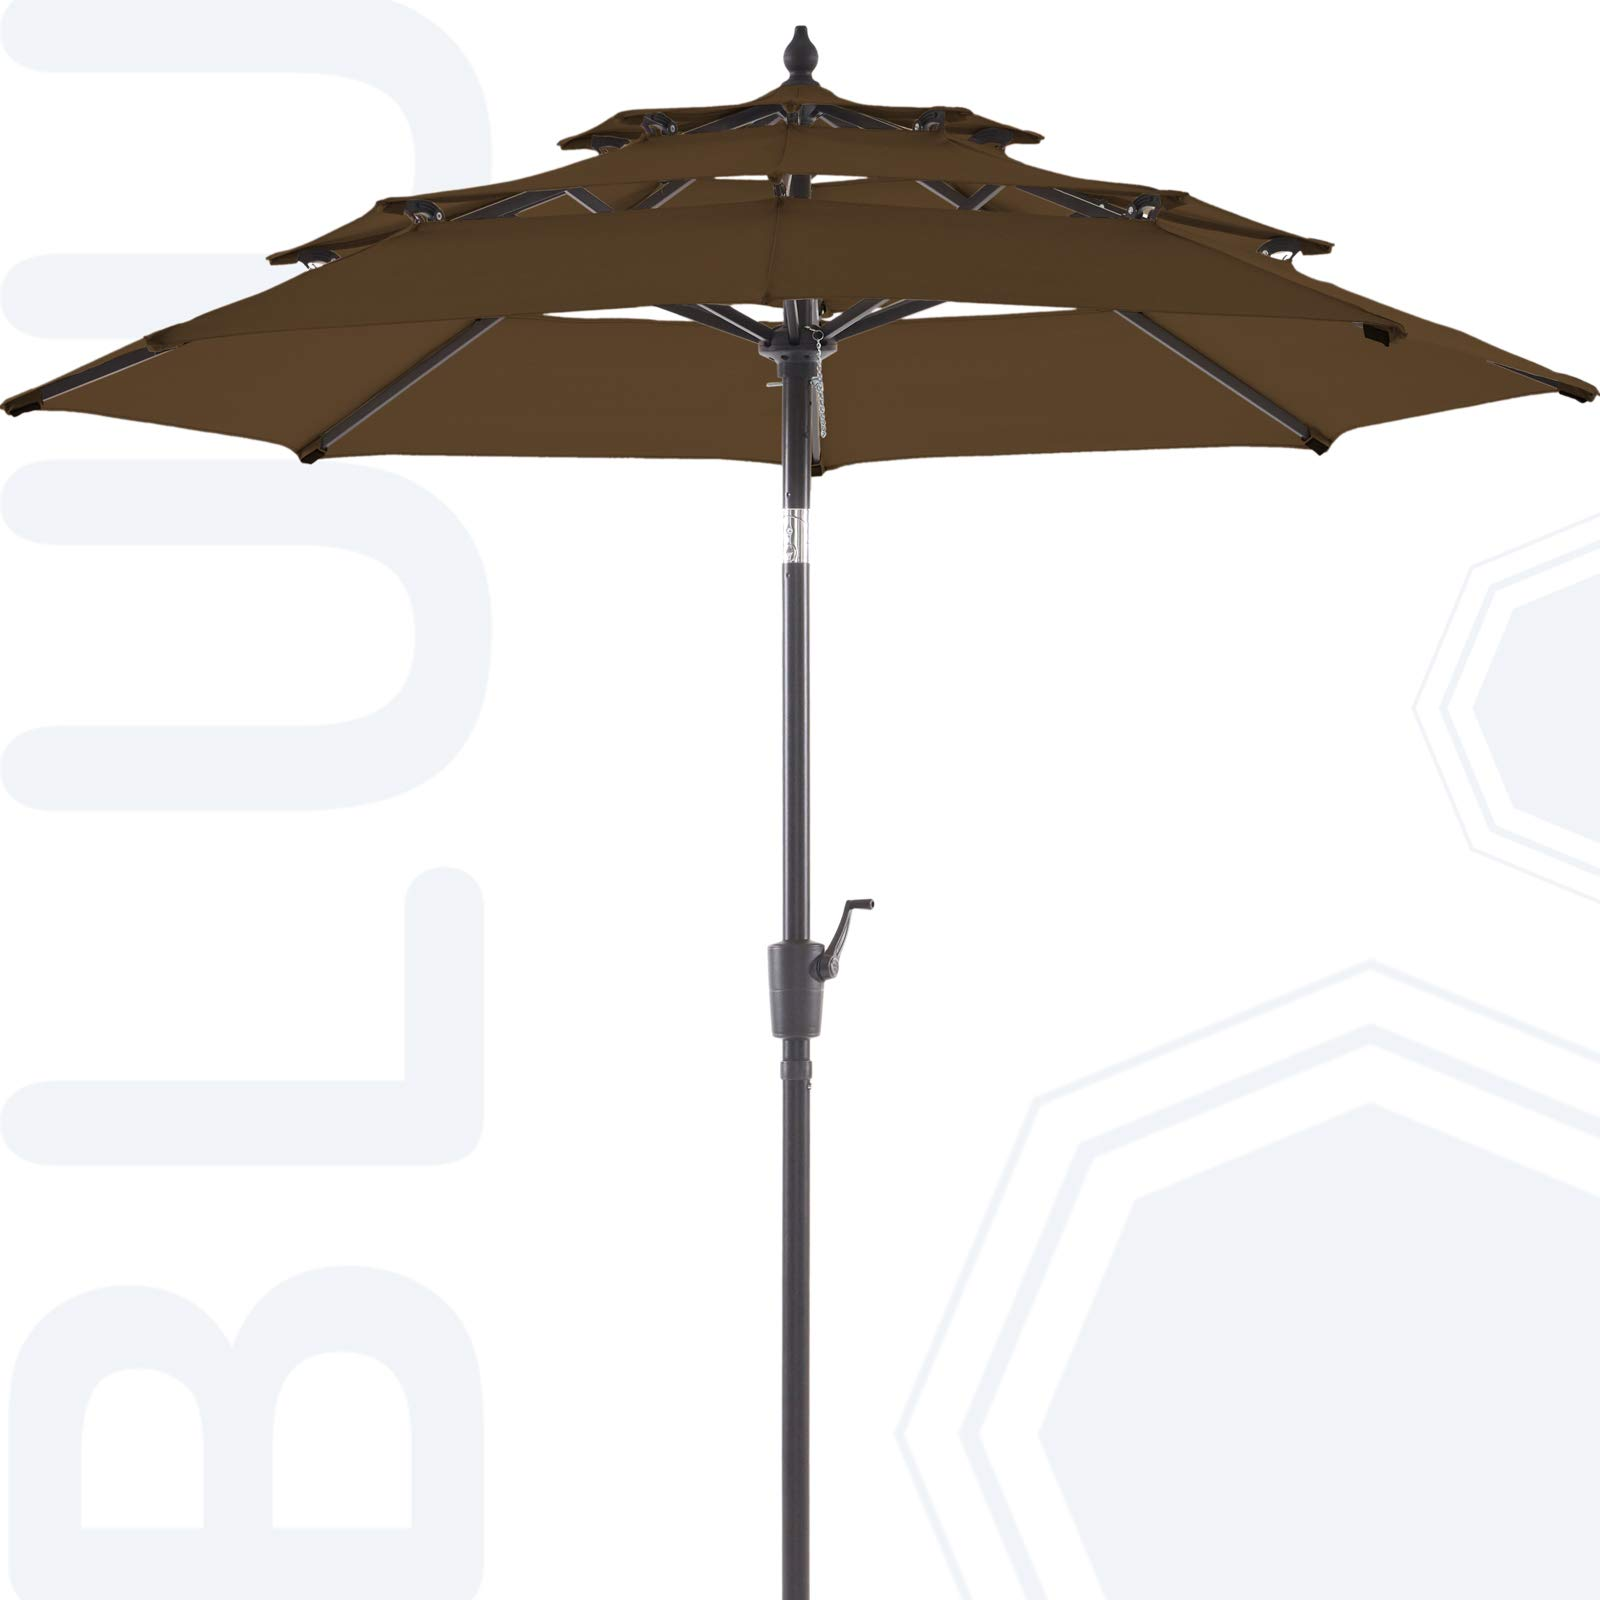 BLUU Olefin 9 FT 3 Tier Patio Market Umbrella Outdoor Table Umbrellas - Fade Resistant Fabric, Market Clearance Umbrellas with 8 Sturdy Ribs & Push Button Tilt for Garden, Lawn & Pool (Mocha)